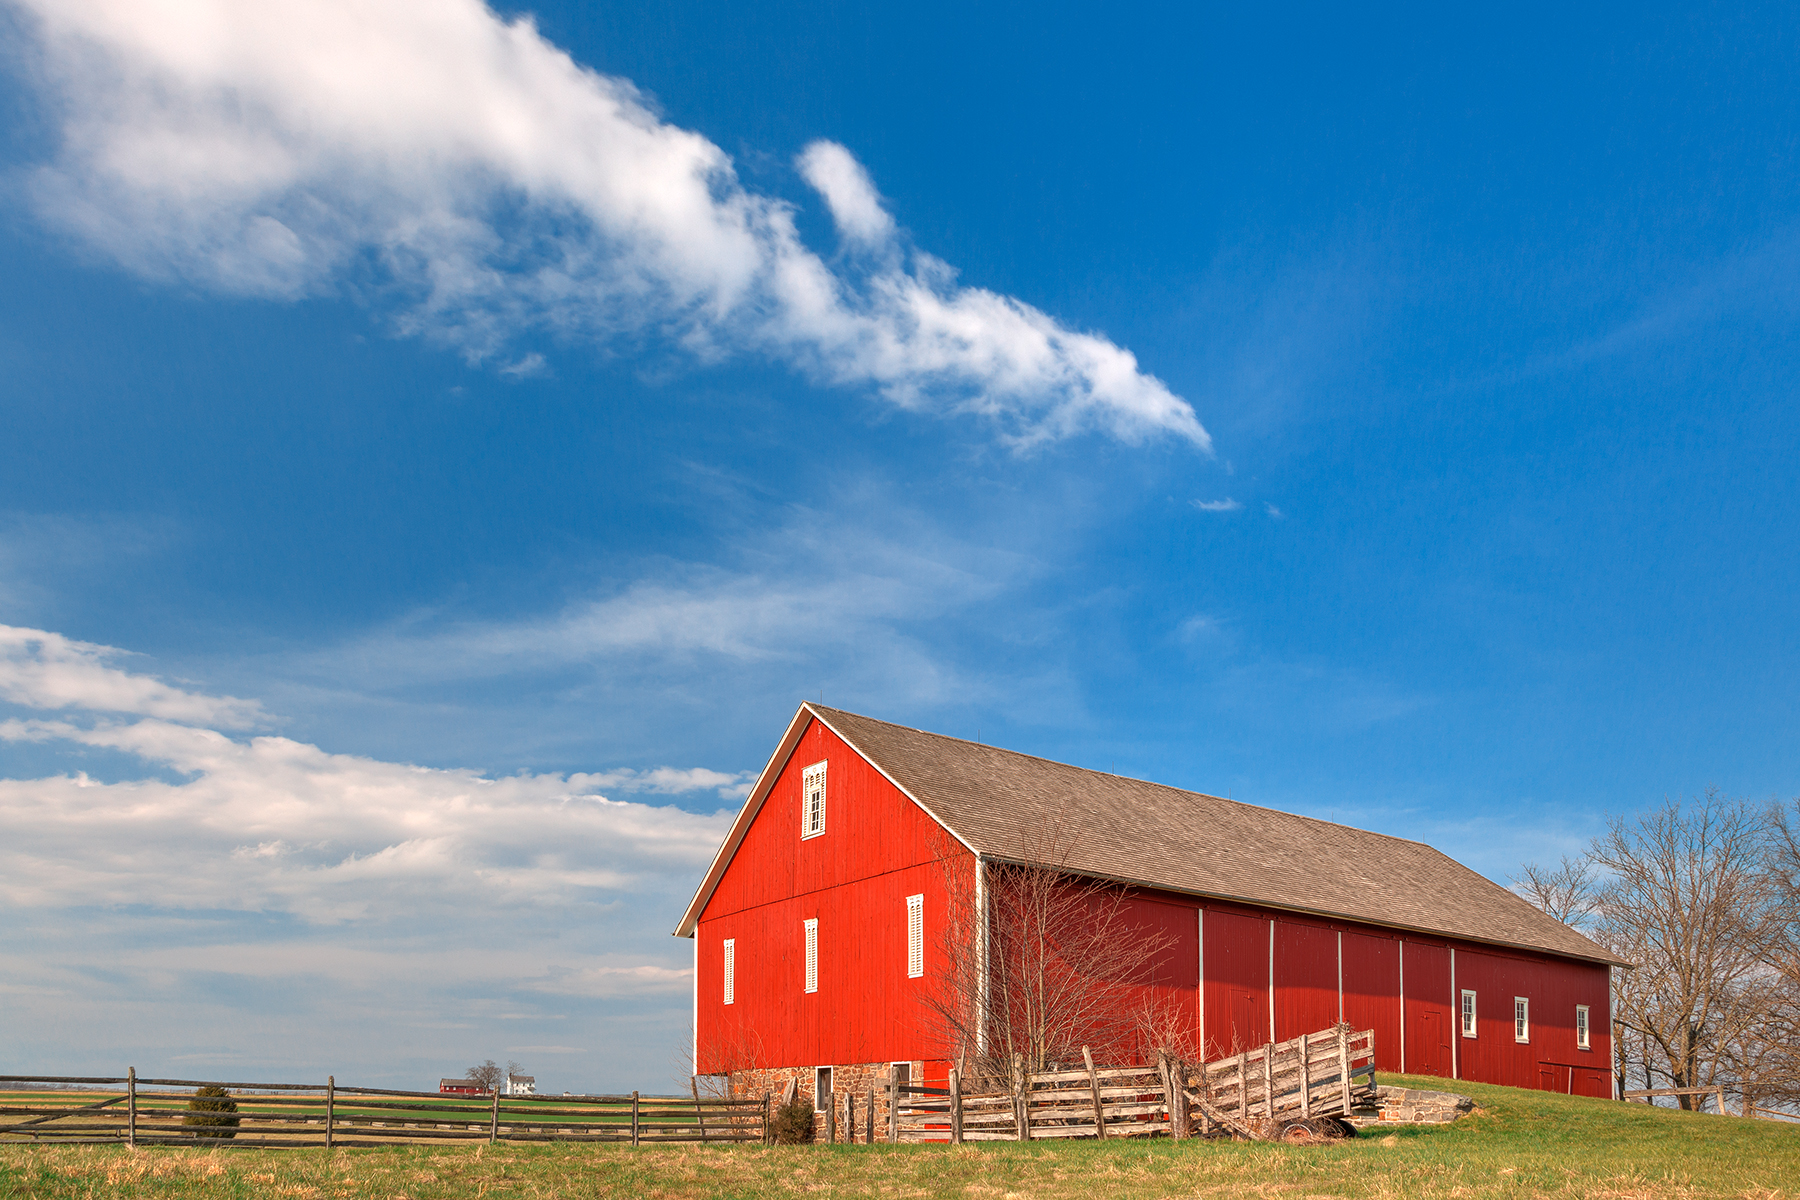 Spangler house farm - hdr photo